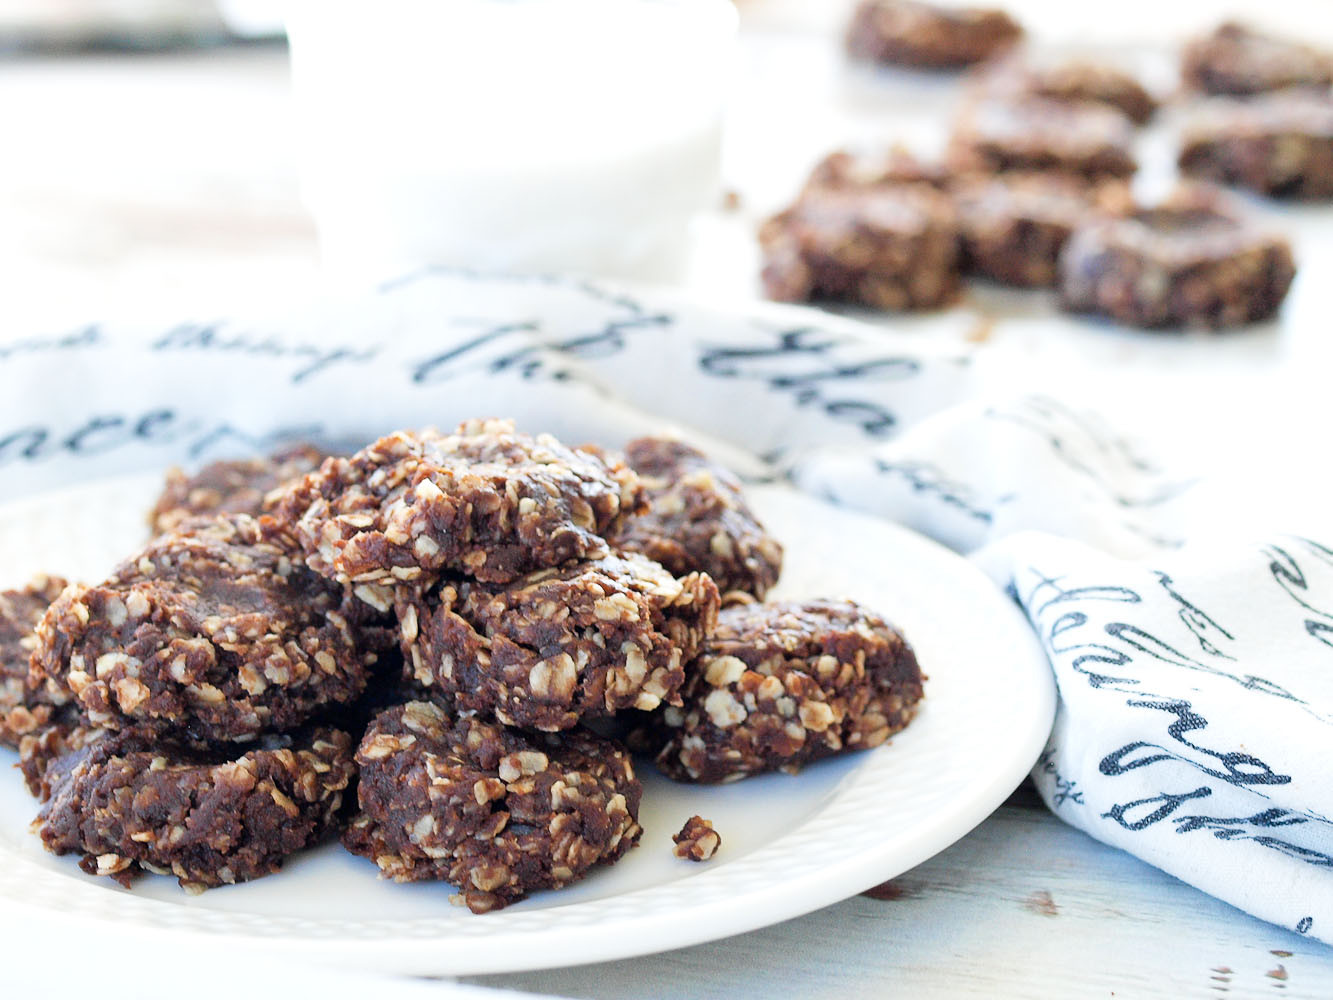 No Bake Cookies Healthy  Healthy No Bake Chocolate Cookies